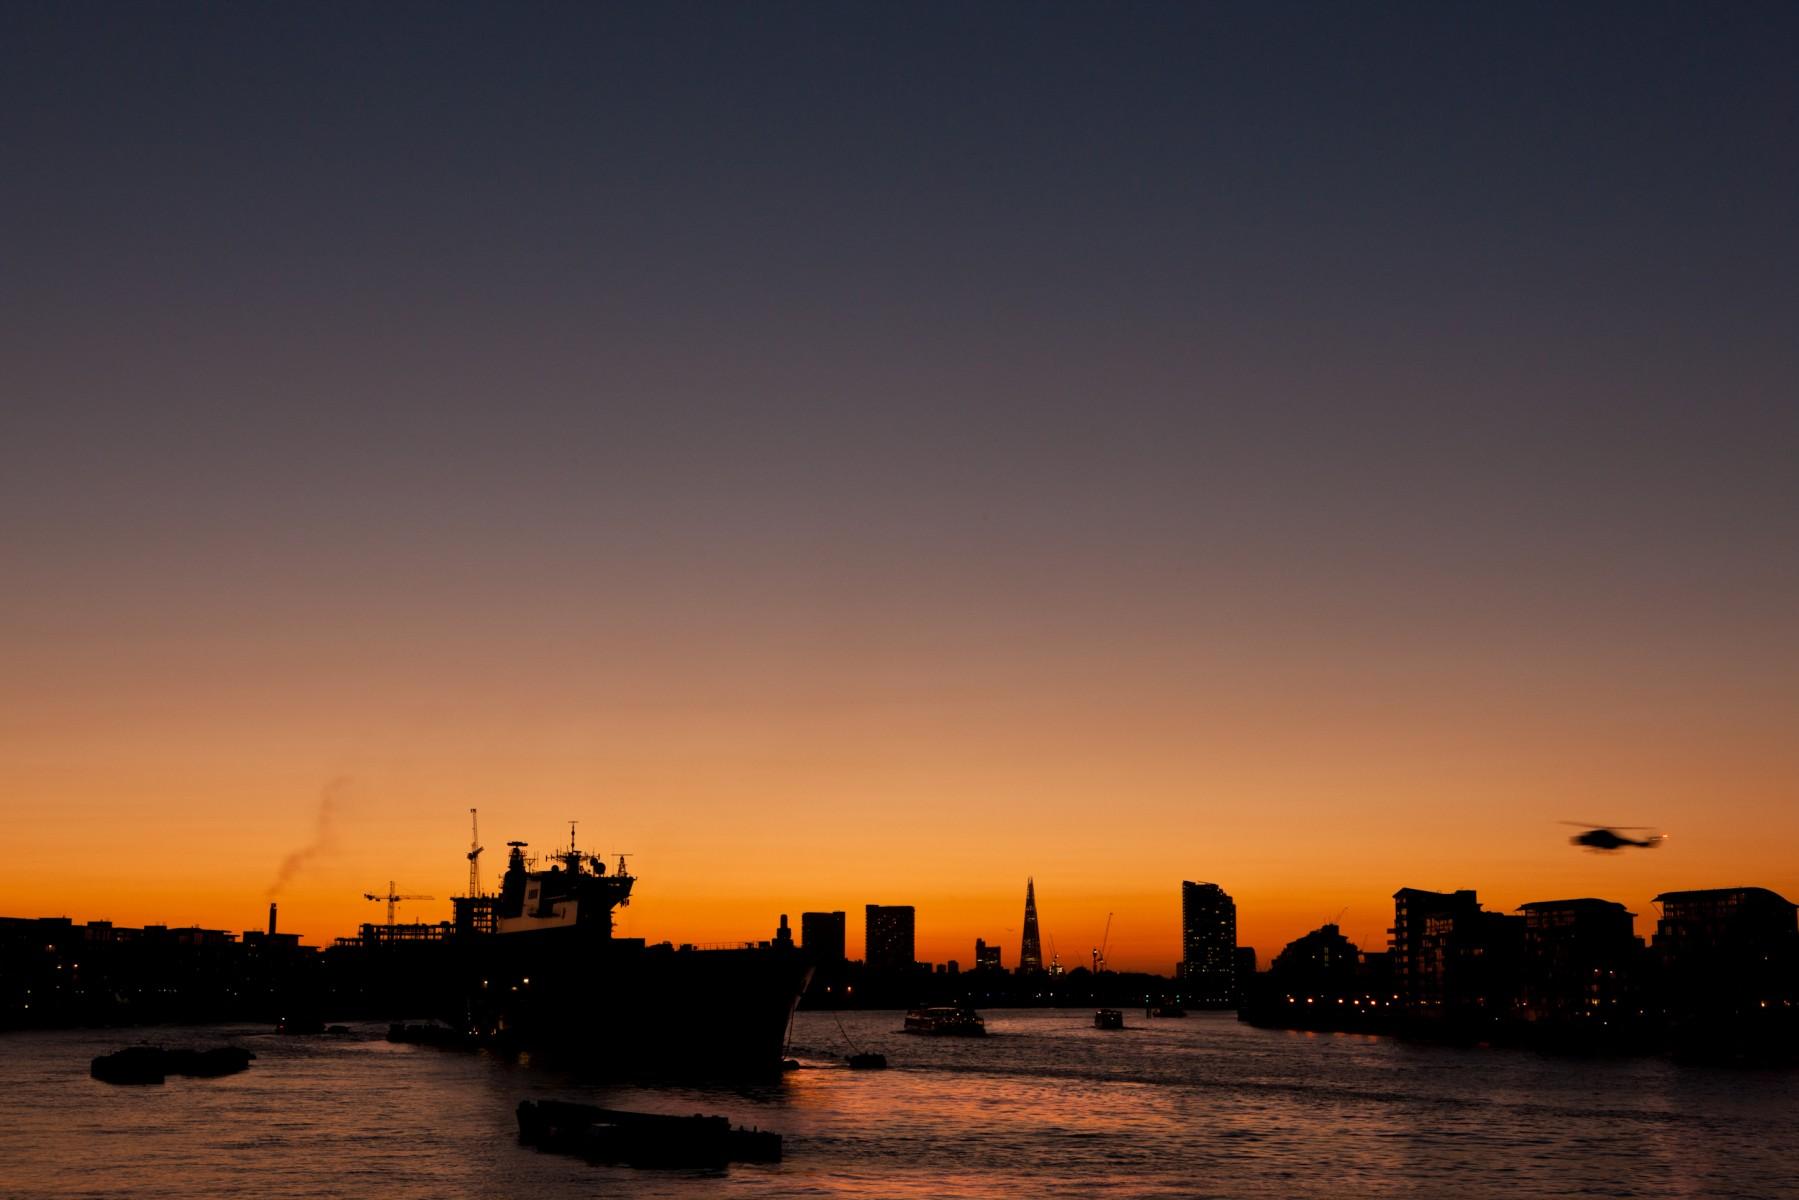 HMS Ocean moored on the Thames near Greenwich